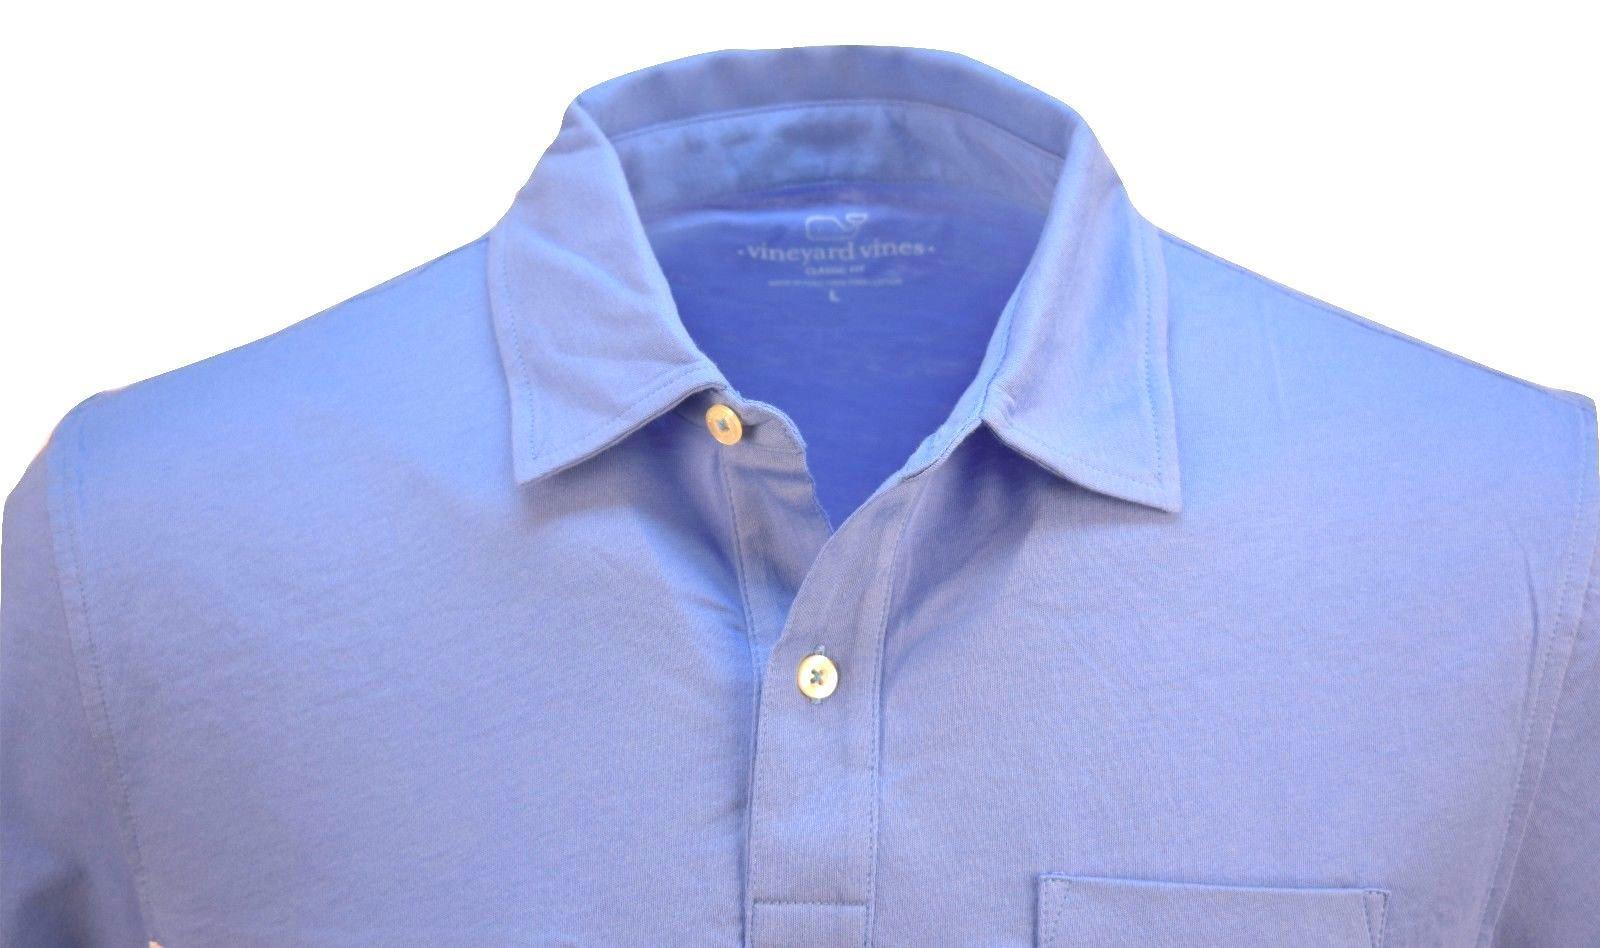 eab6c14ce0 Vineyard Vines Men's Jersey Polo Golf Shirt Breaker Blue Stripes $75[M] -  Walmart.com